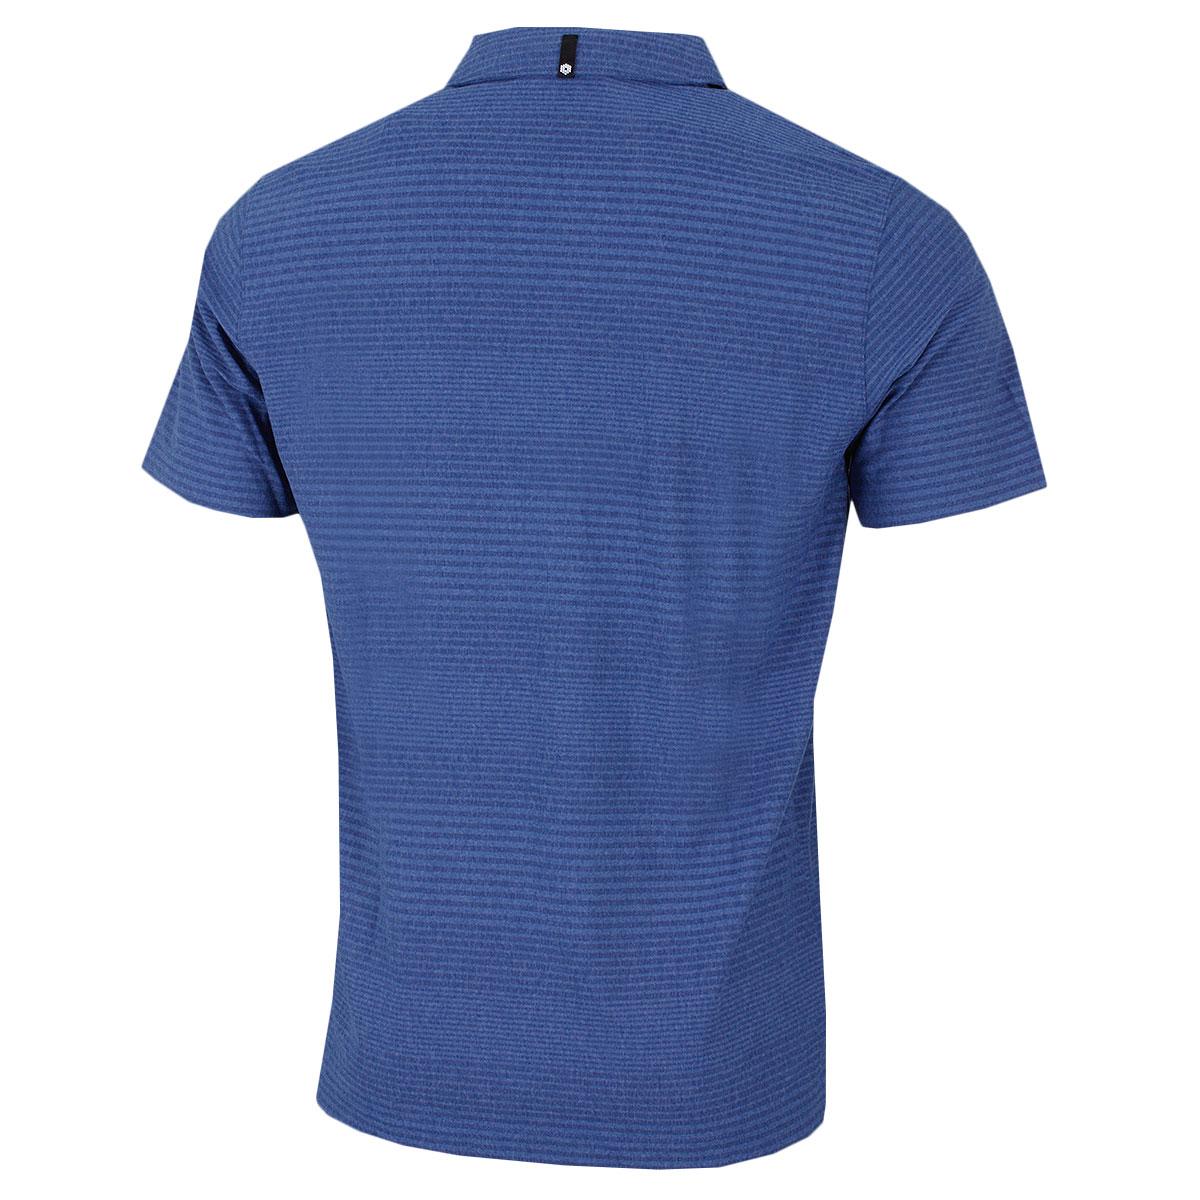 Puma-Golf-Mens-Aston-DRYCELL-UPF-50-Moisture-Wicking-Polo-Shirt-45-OFF-RRP thumbnail 14